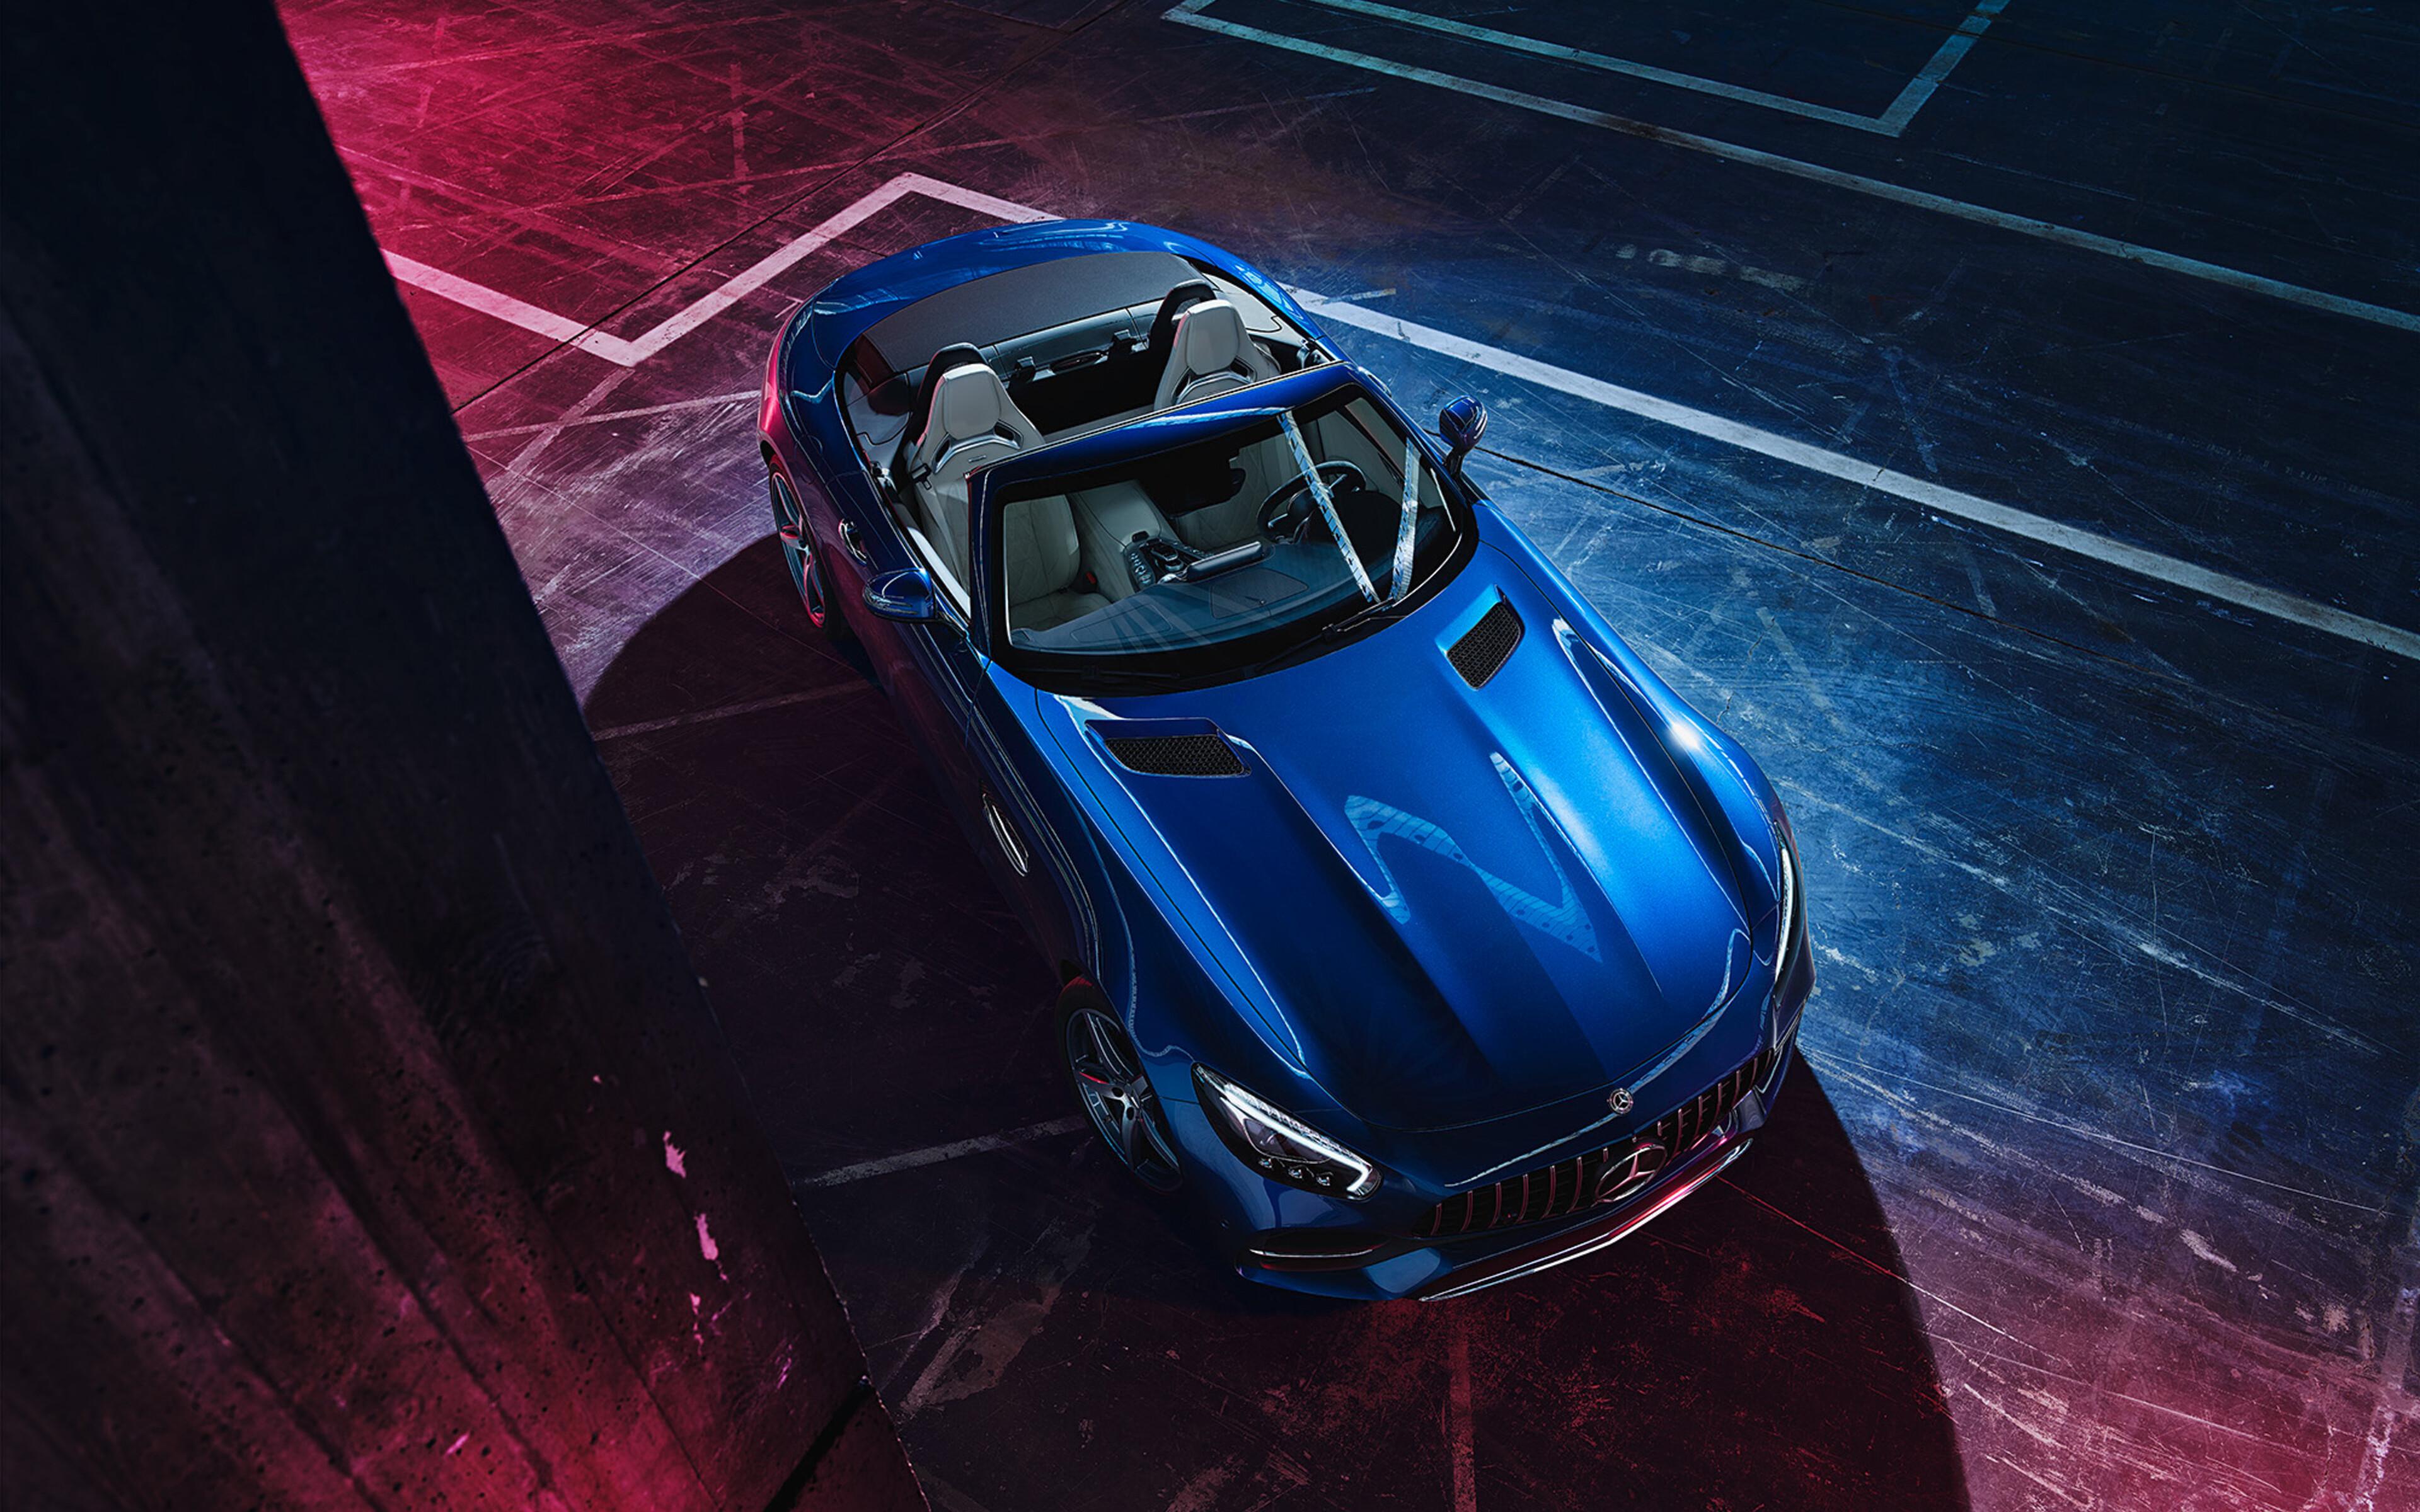 3840x2400 Blue Mercedes Benz Amg GT 2019 4k HD 4k ...